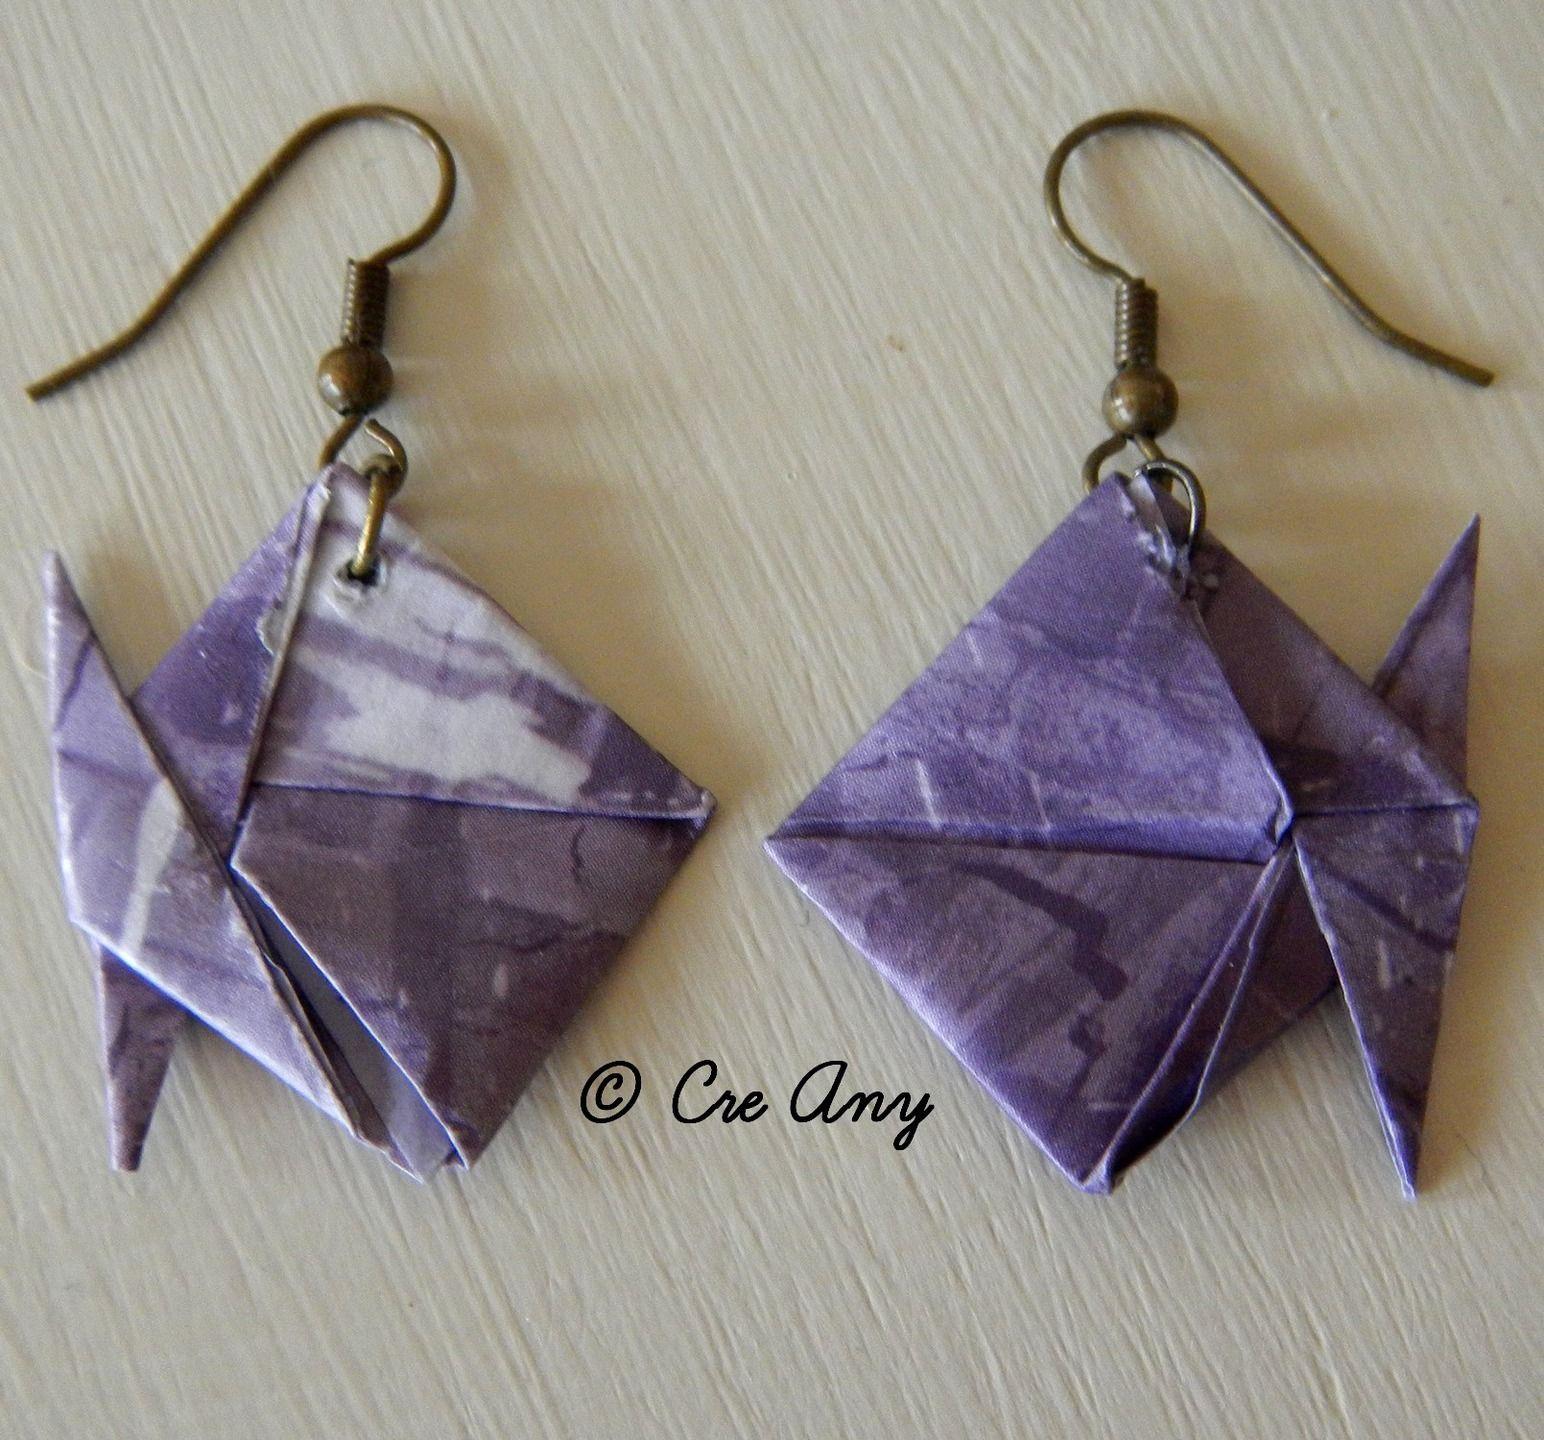 Boucle d'oreille fantaisie origami